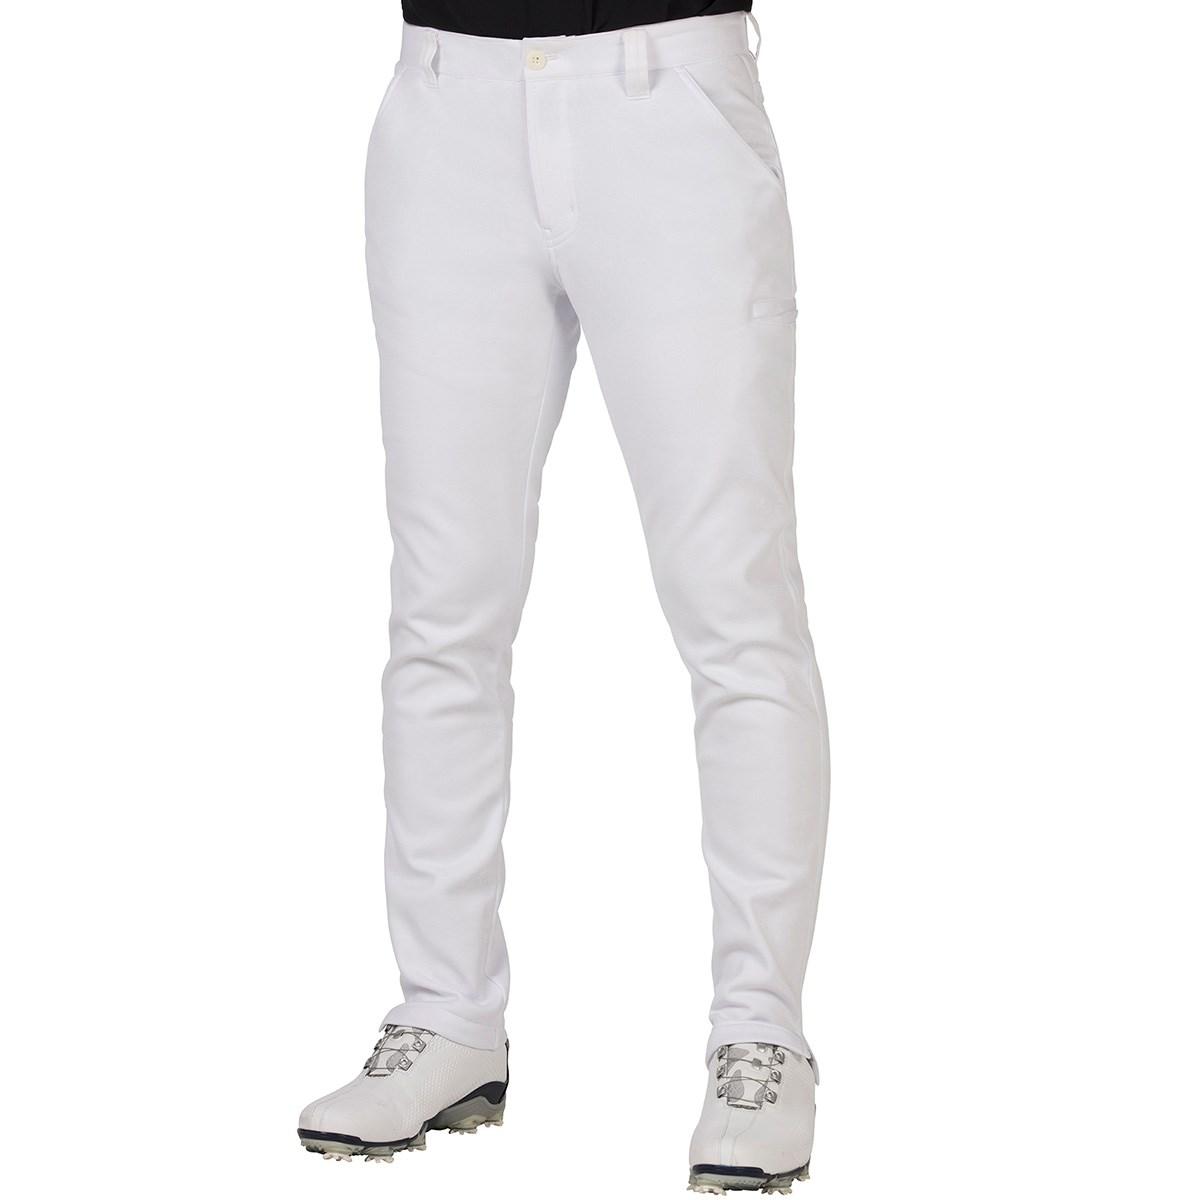 GDO オリジナル GDO ORIGINAL 7ポケットボンディングパンツ 股下76cm 0:ウエスト目安72-74 ホワイト